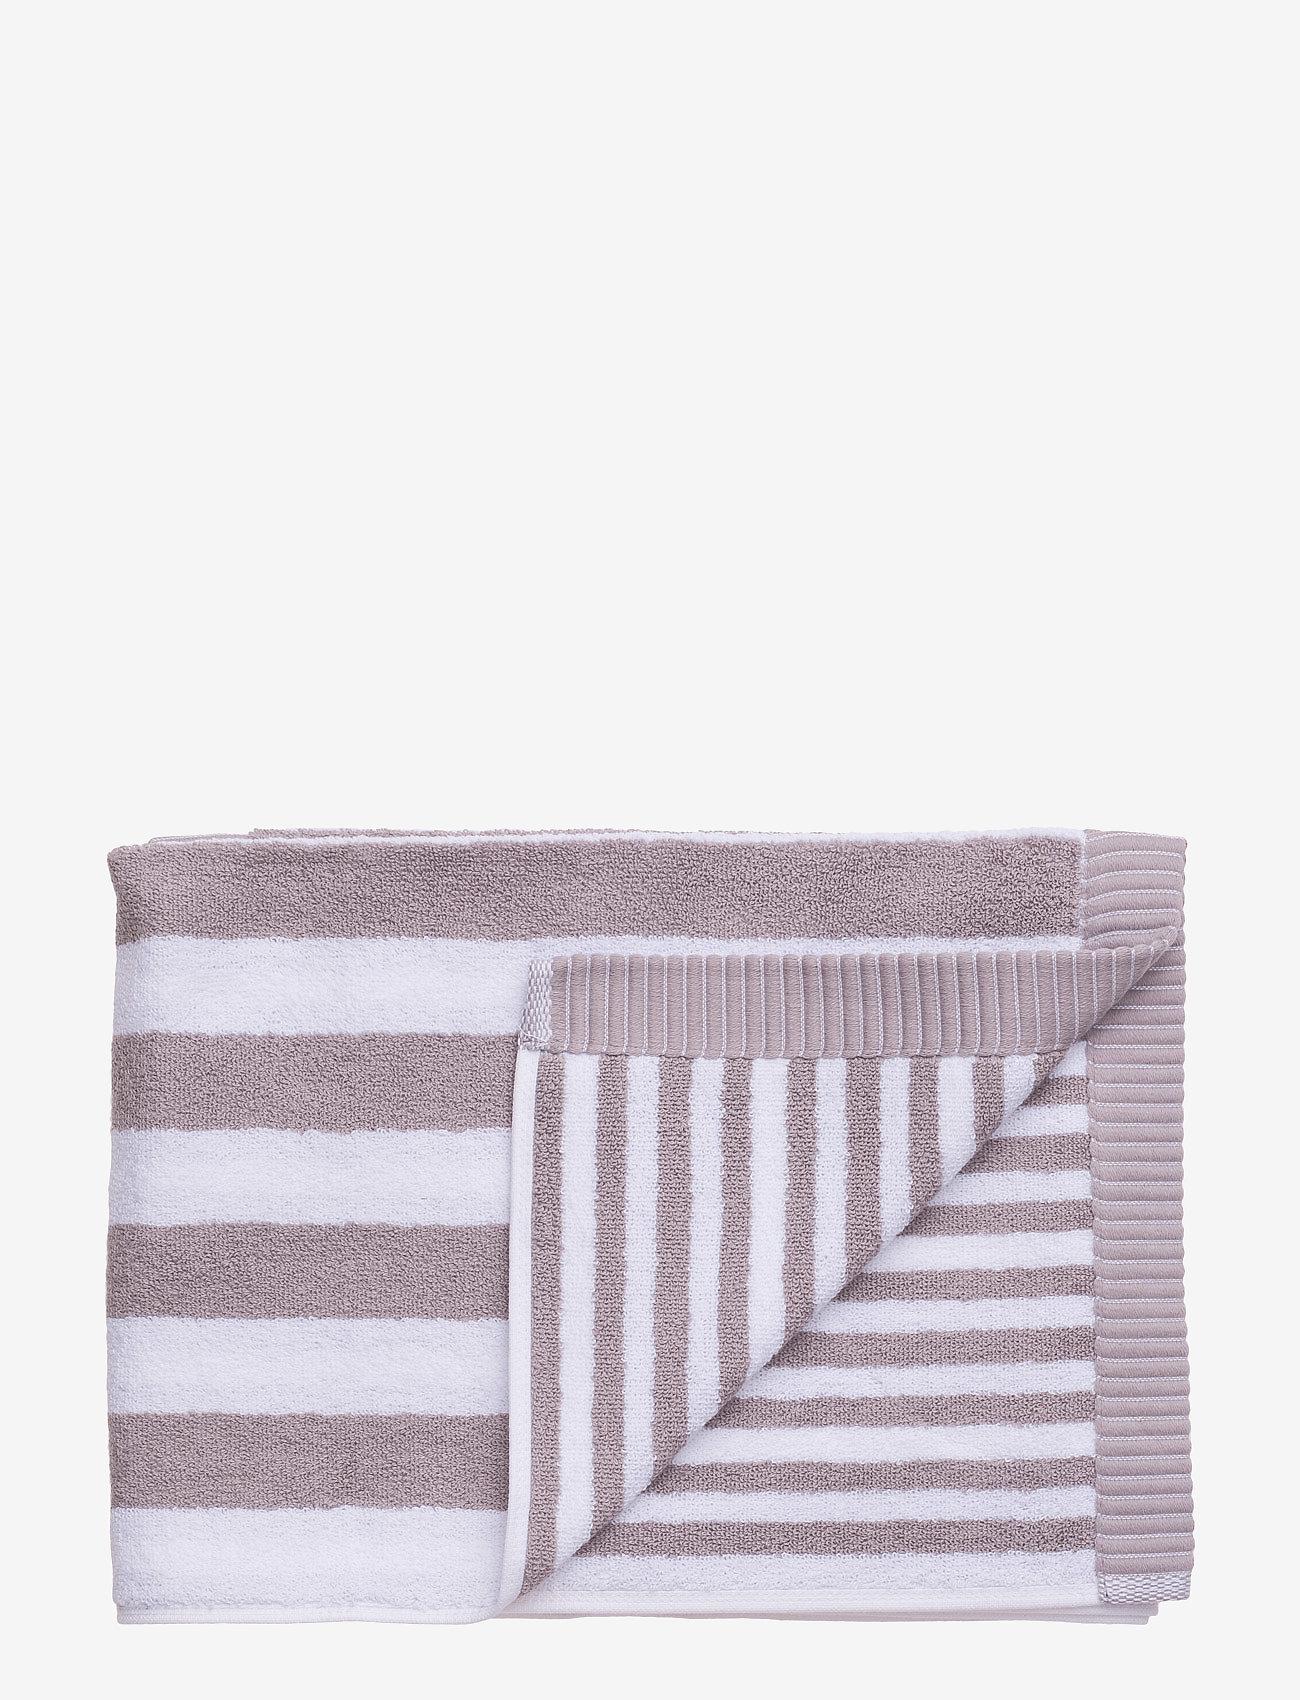 Marimekko Home - KAKSI RAITAA GUEST TOWEL - hand towels & bath towels - grey, white - 0